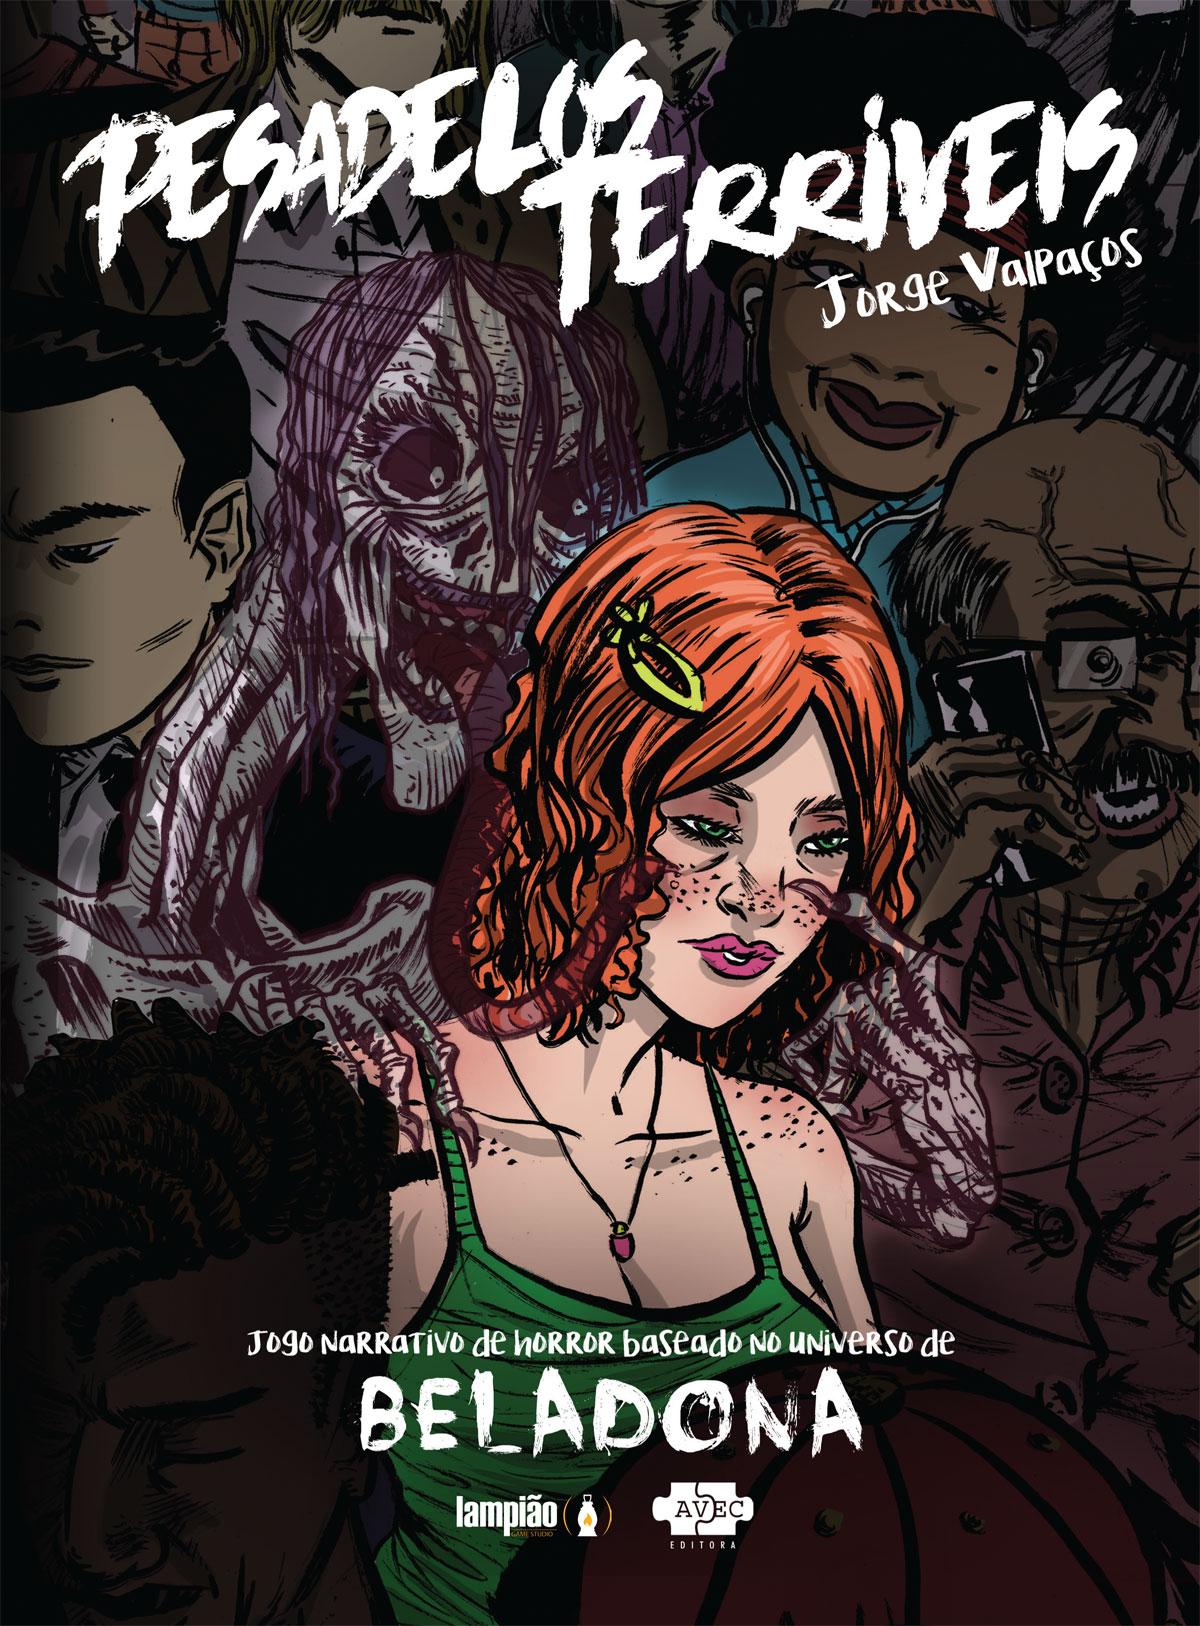 Resenha | Pesadelos Terríveis – Jorge Valpaços